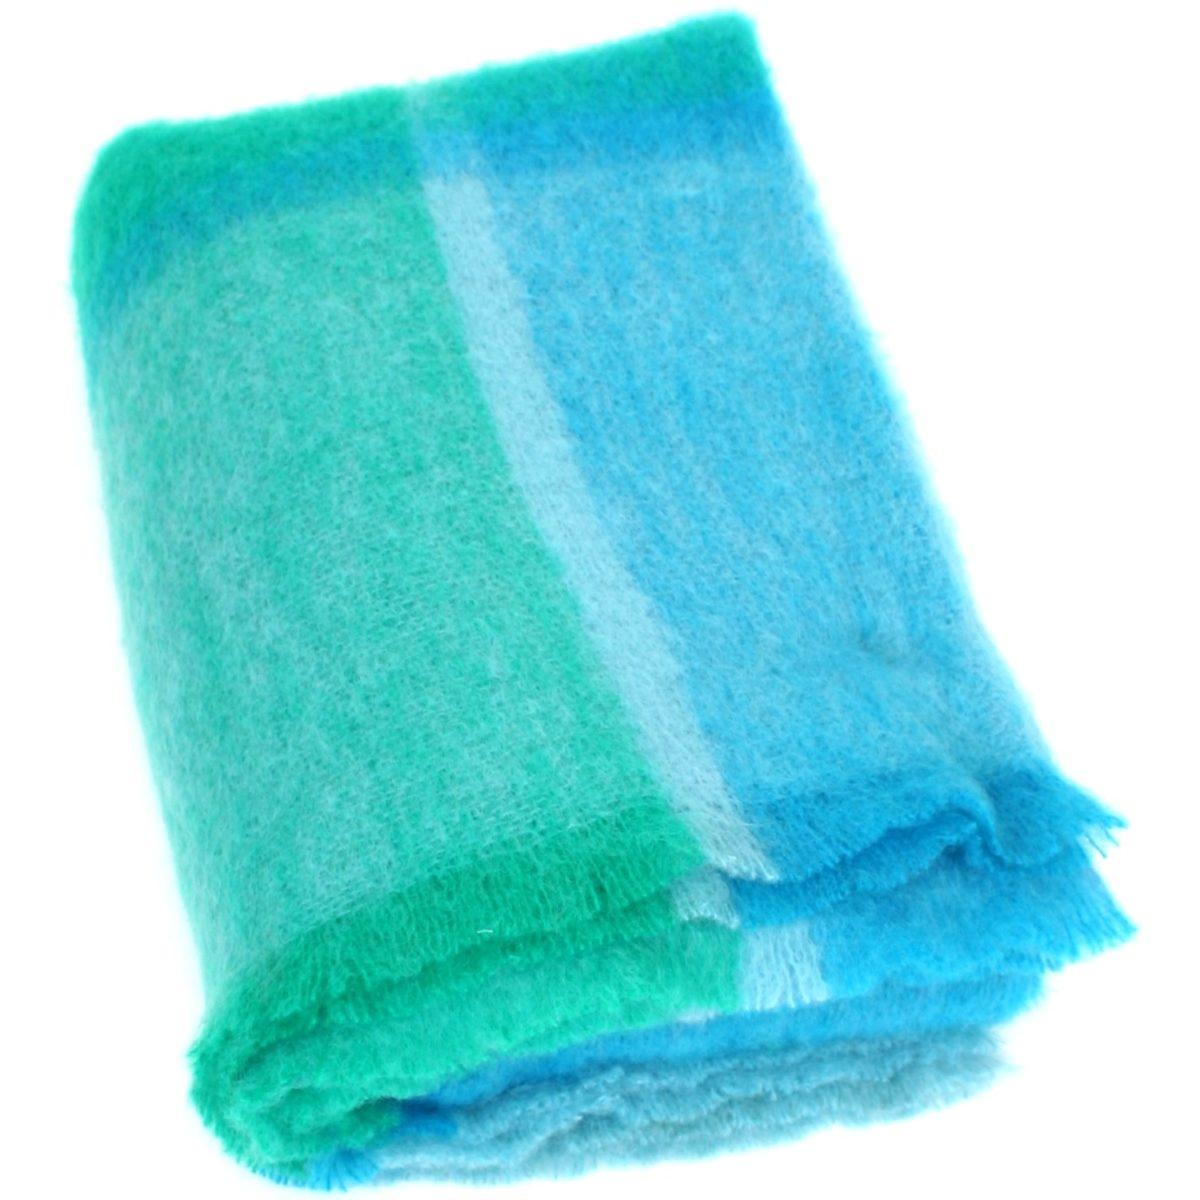 Mohair Blanket - Turquoise